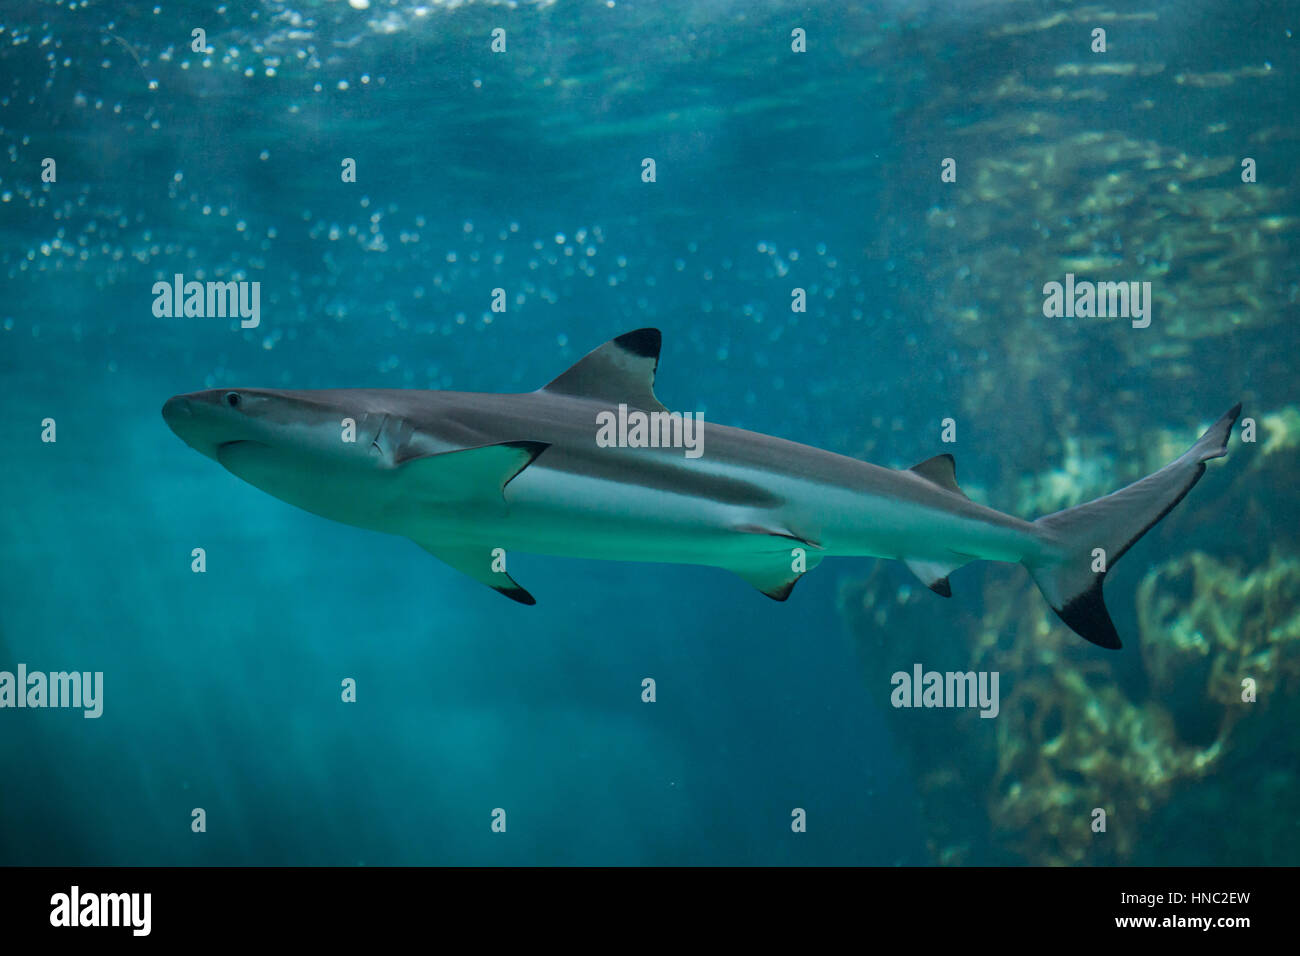 Blacktip reef shark (Carcharhinus melanopterus). Marine fish. - Stock Image